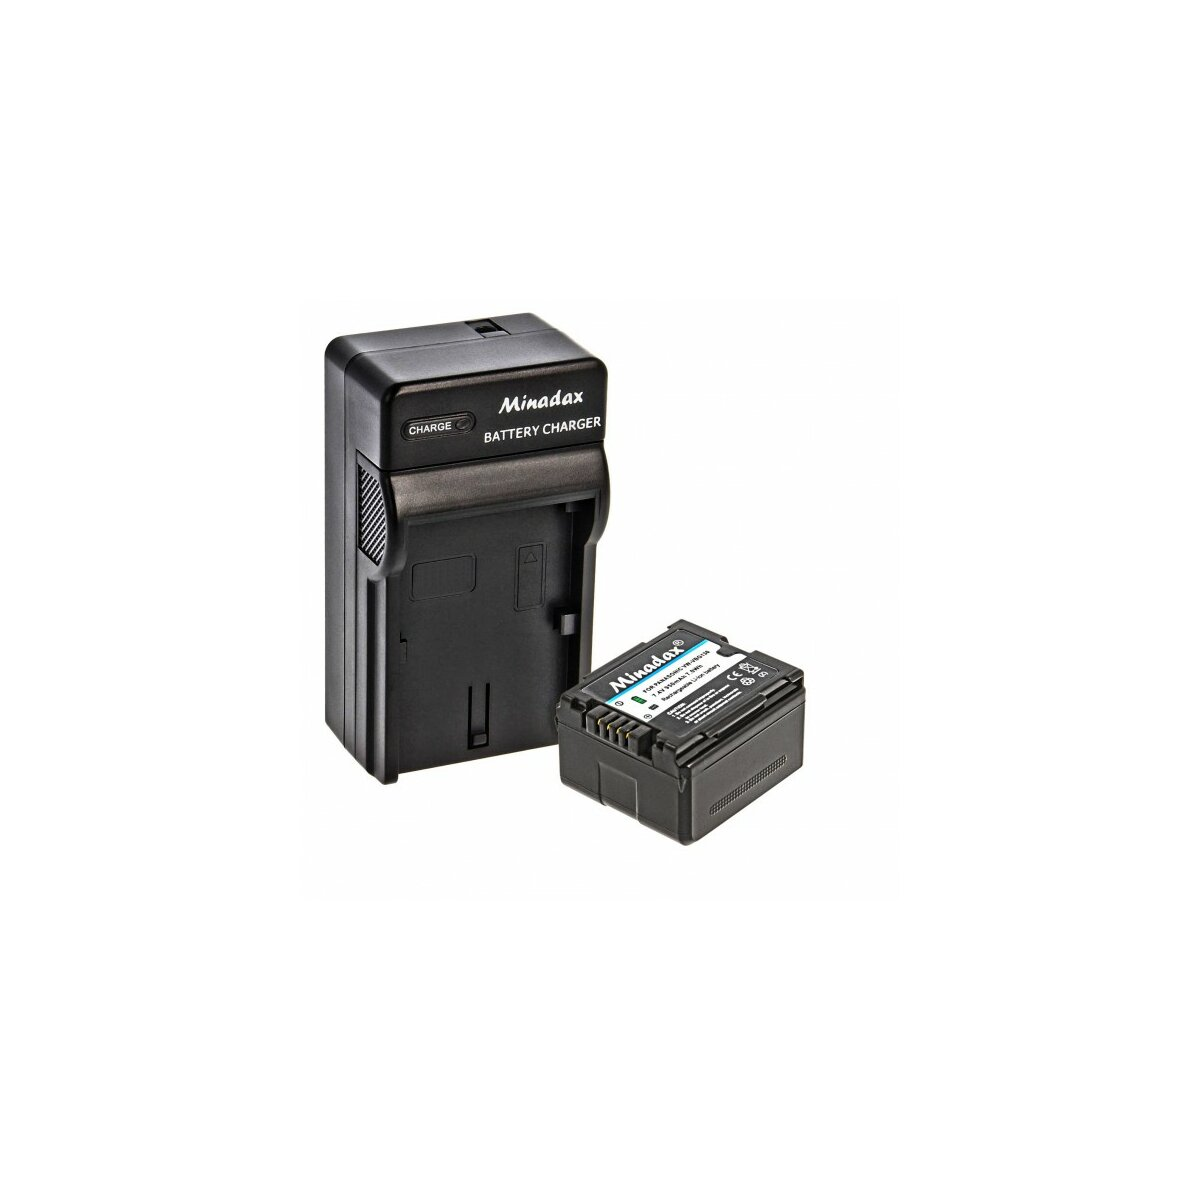 Minadax® Ladegeraet 100% kompatibel fuer Panasonic VW-VBG130 inkl. Auto Ladekabel, Ladeschale austauschbar + 1x Akku wie VW-VBG130